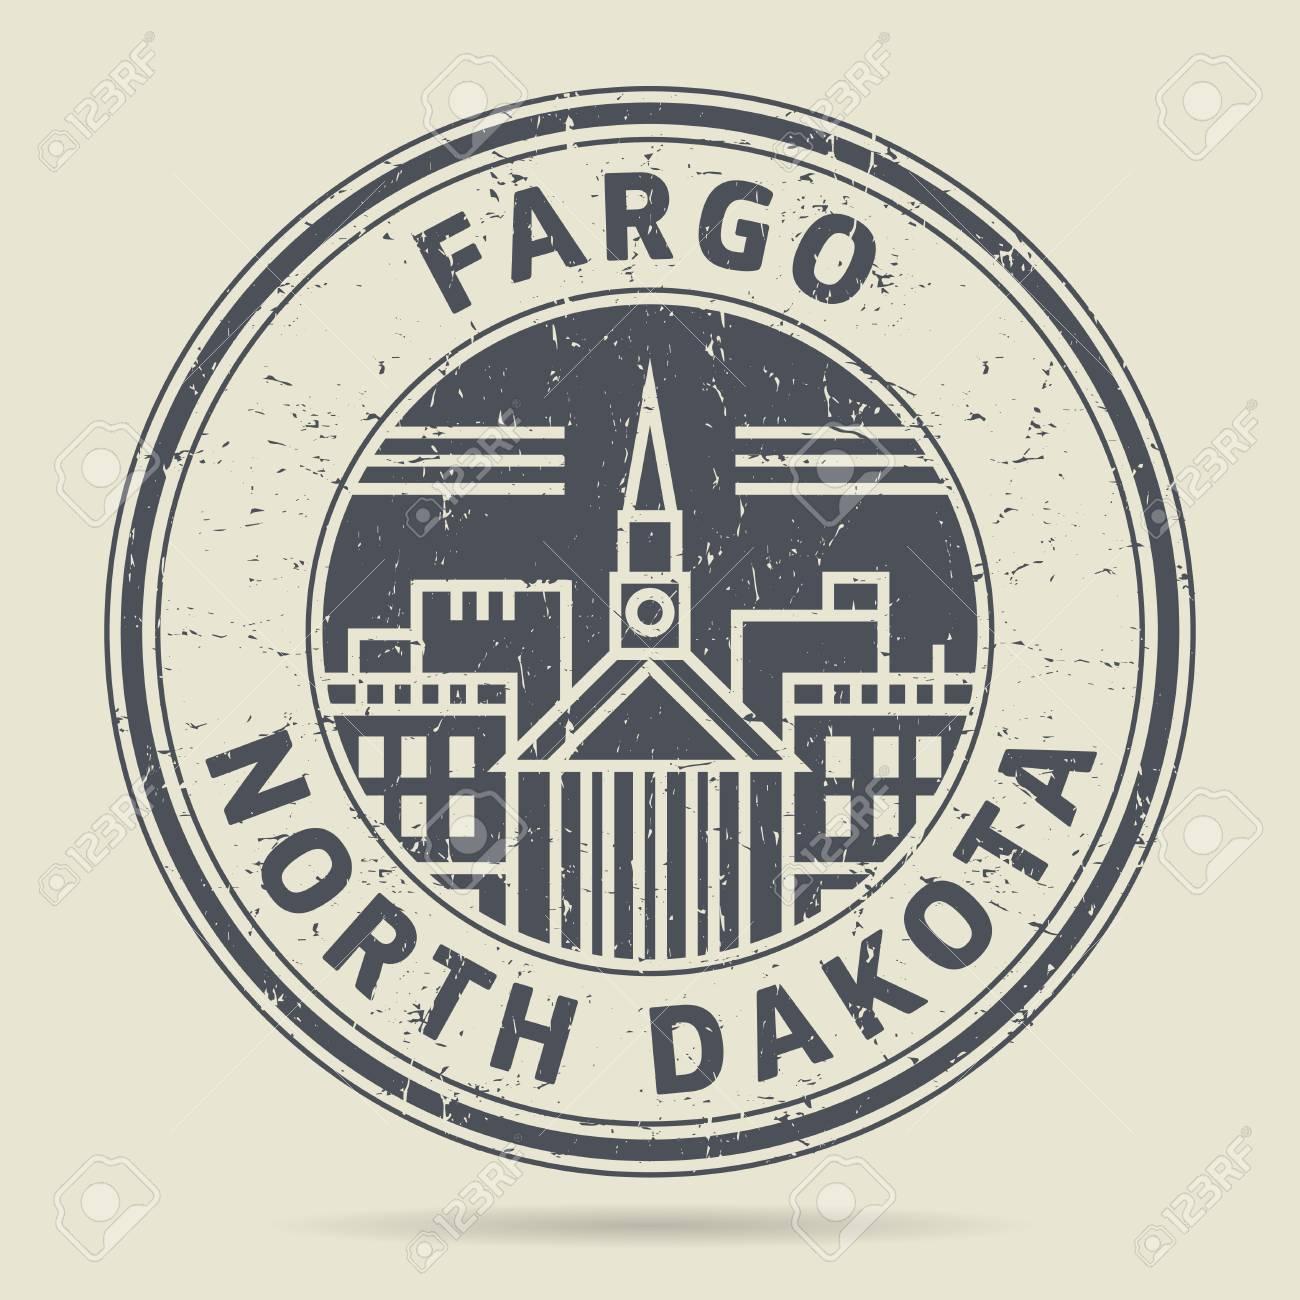 Grunge Rubber Stamp Or Label With Text Fargo North Dakota Written Inside Vector Illustration